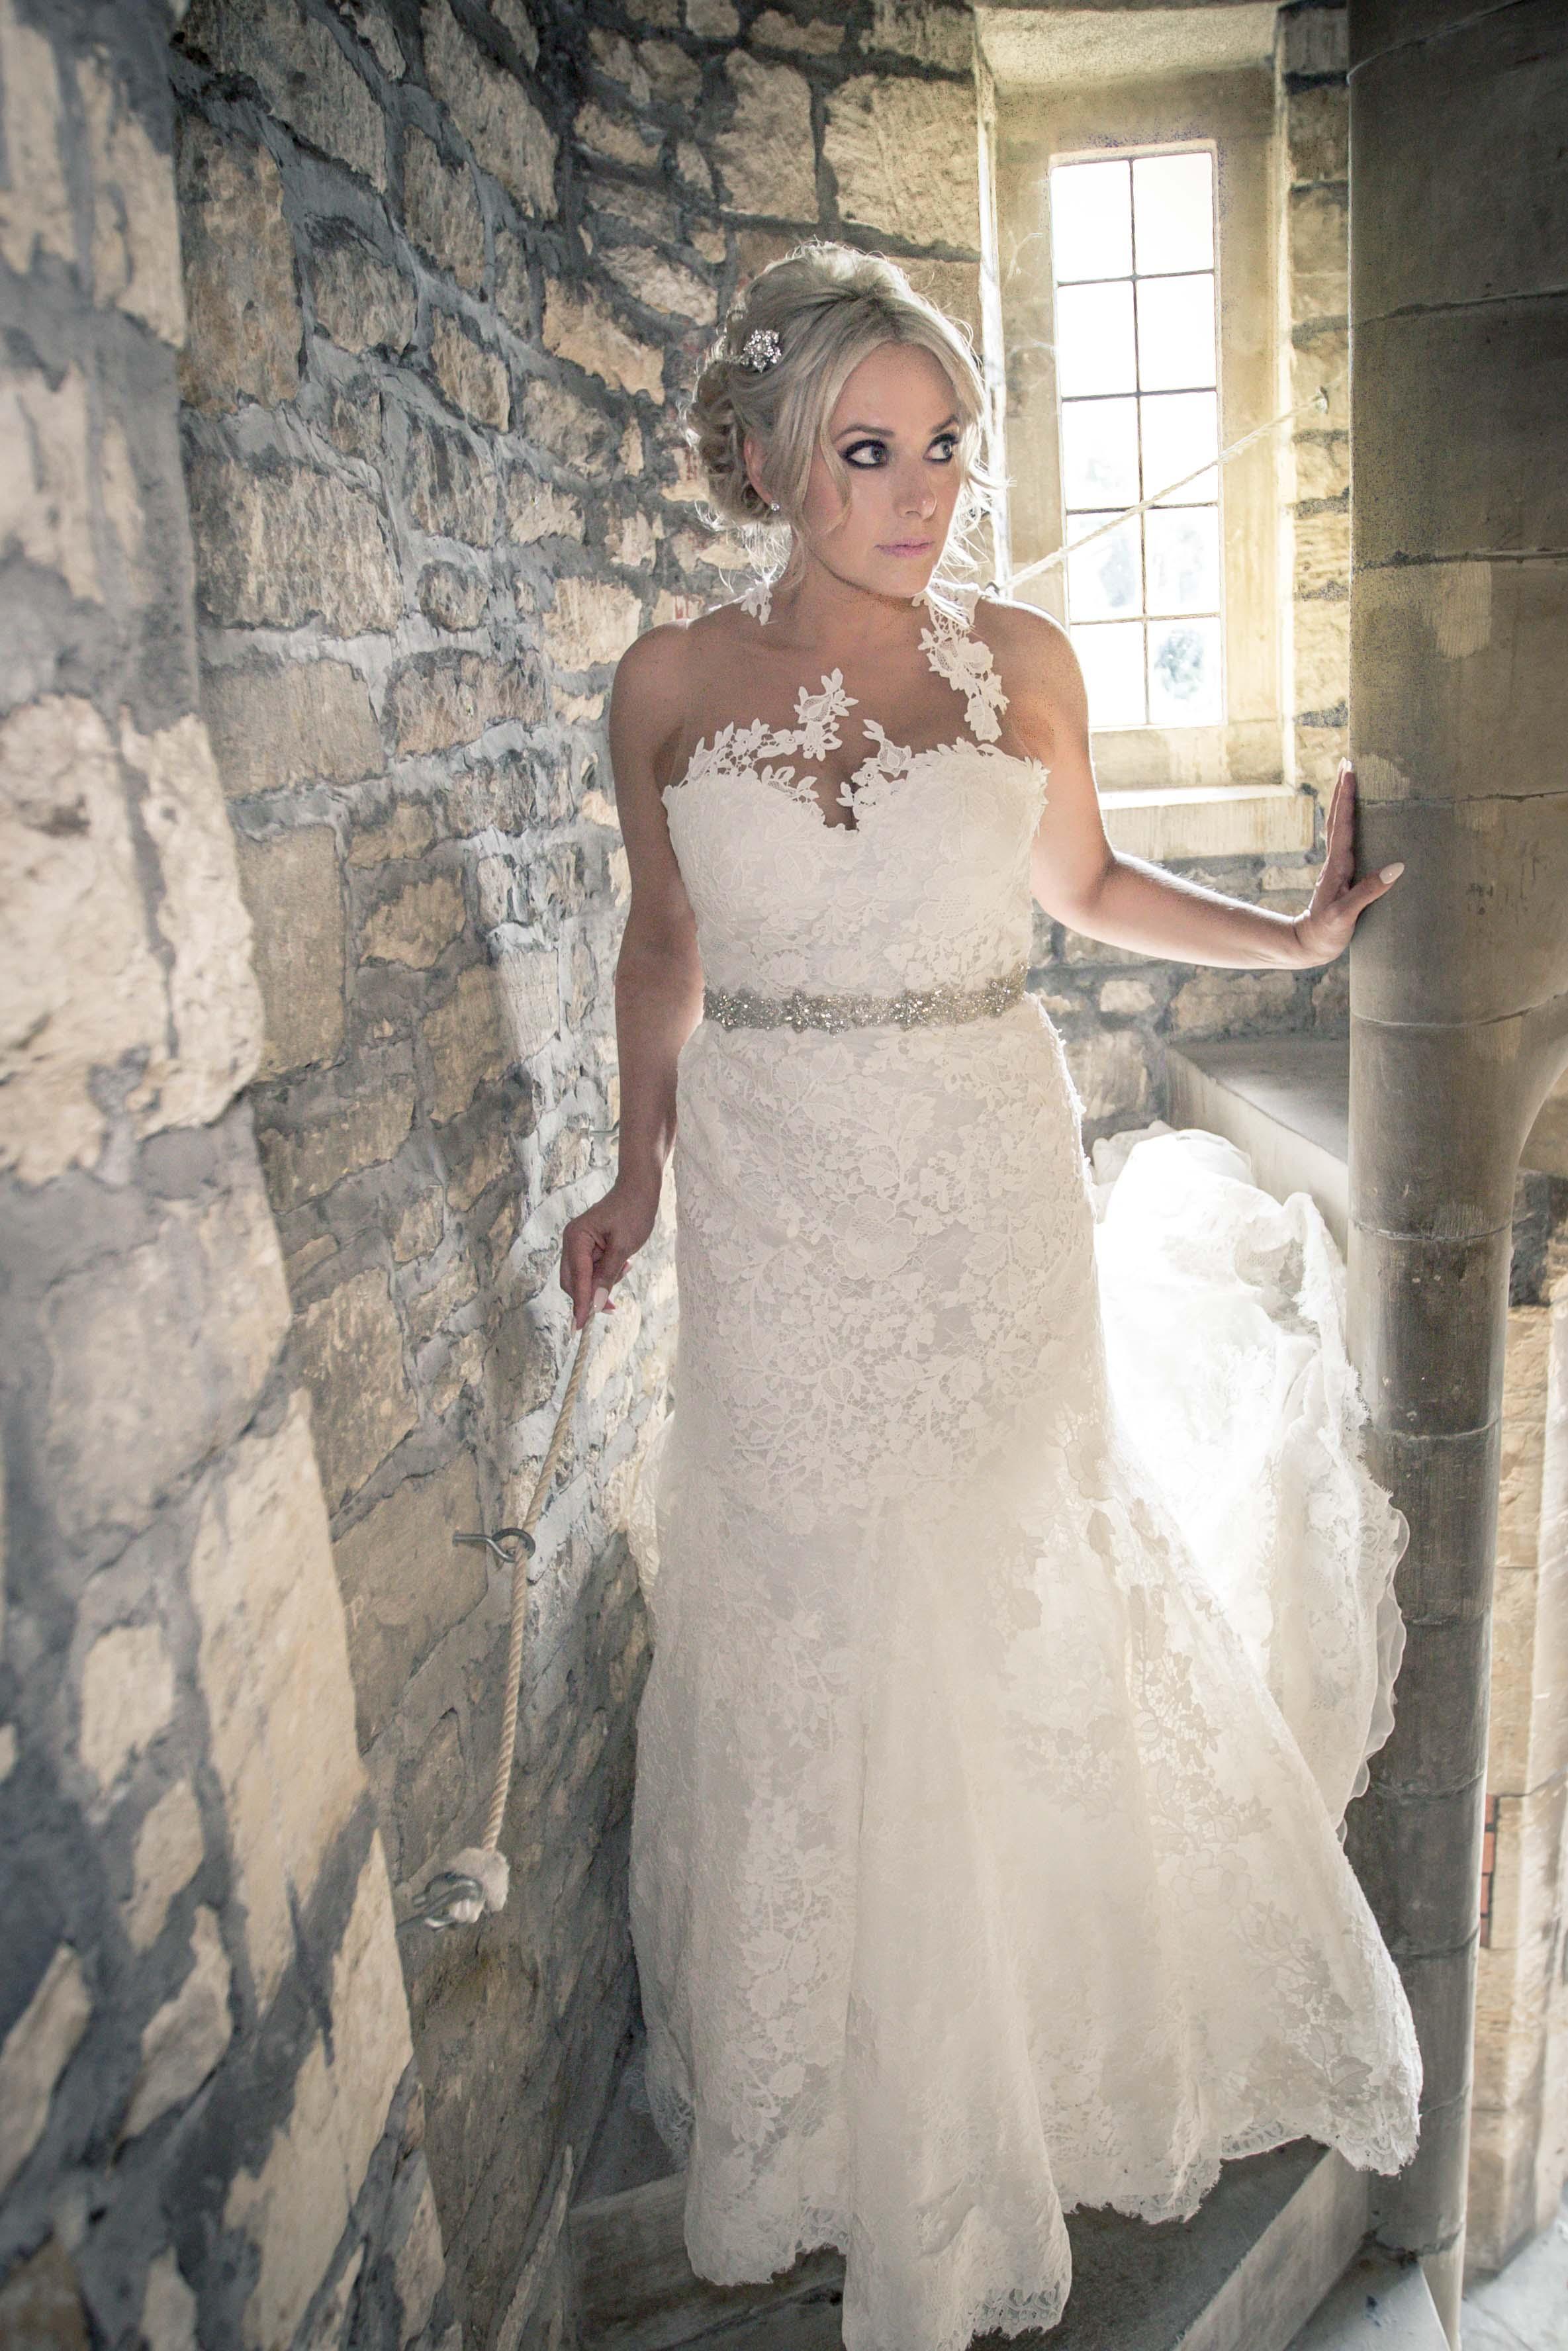 cotswold-wedding-photography-at-stonehouse-court-hotel-natalia-smith-photography-gloucestershire-wedding-photographer-48.jpg